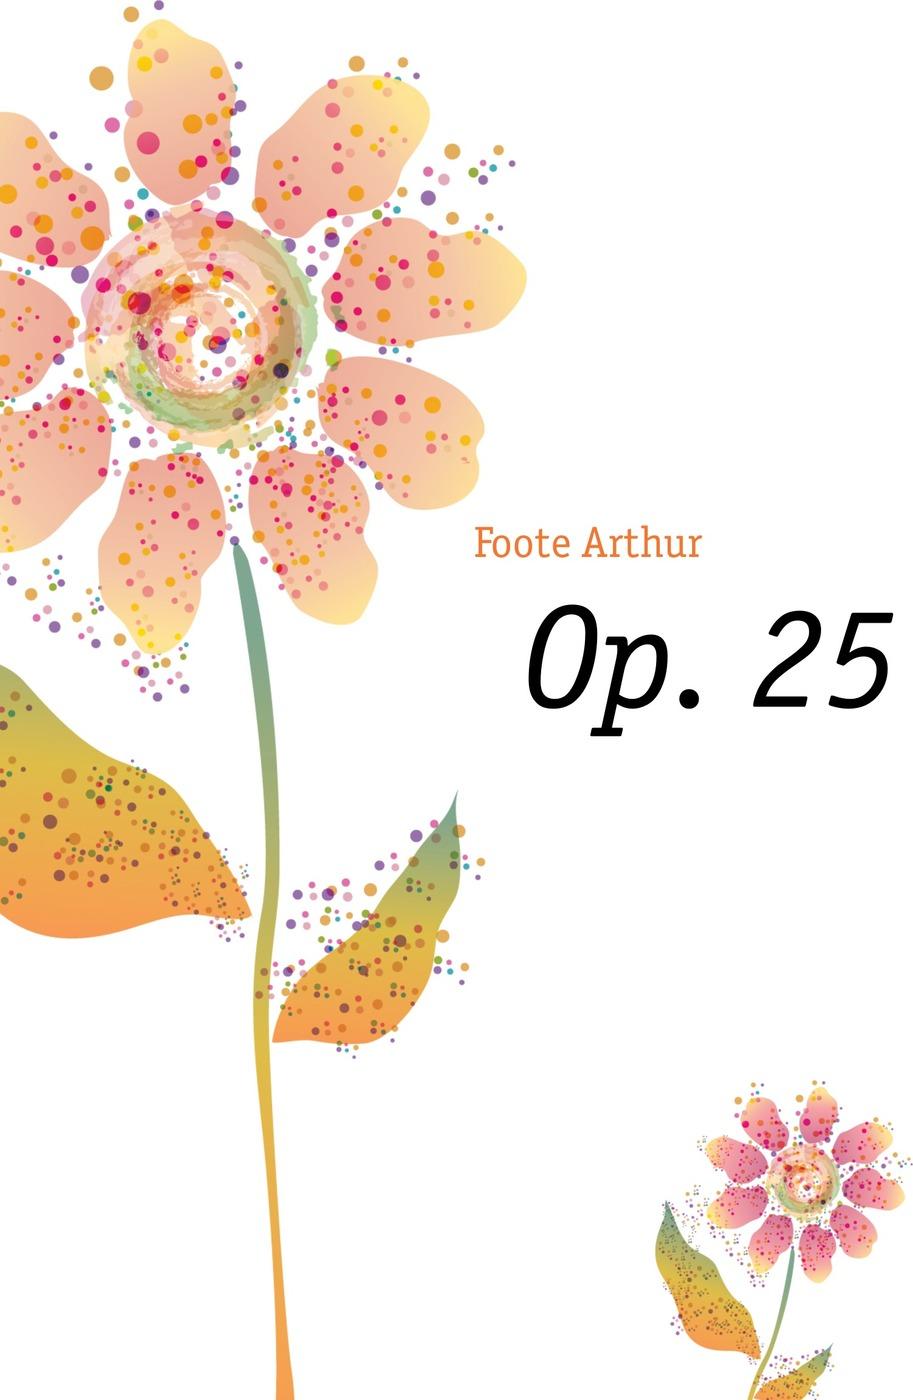 Foote Arthur Op. 25